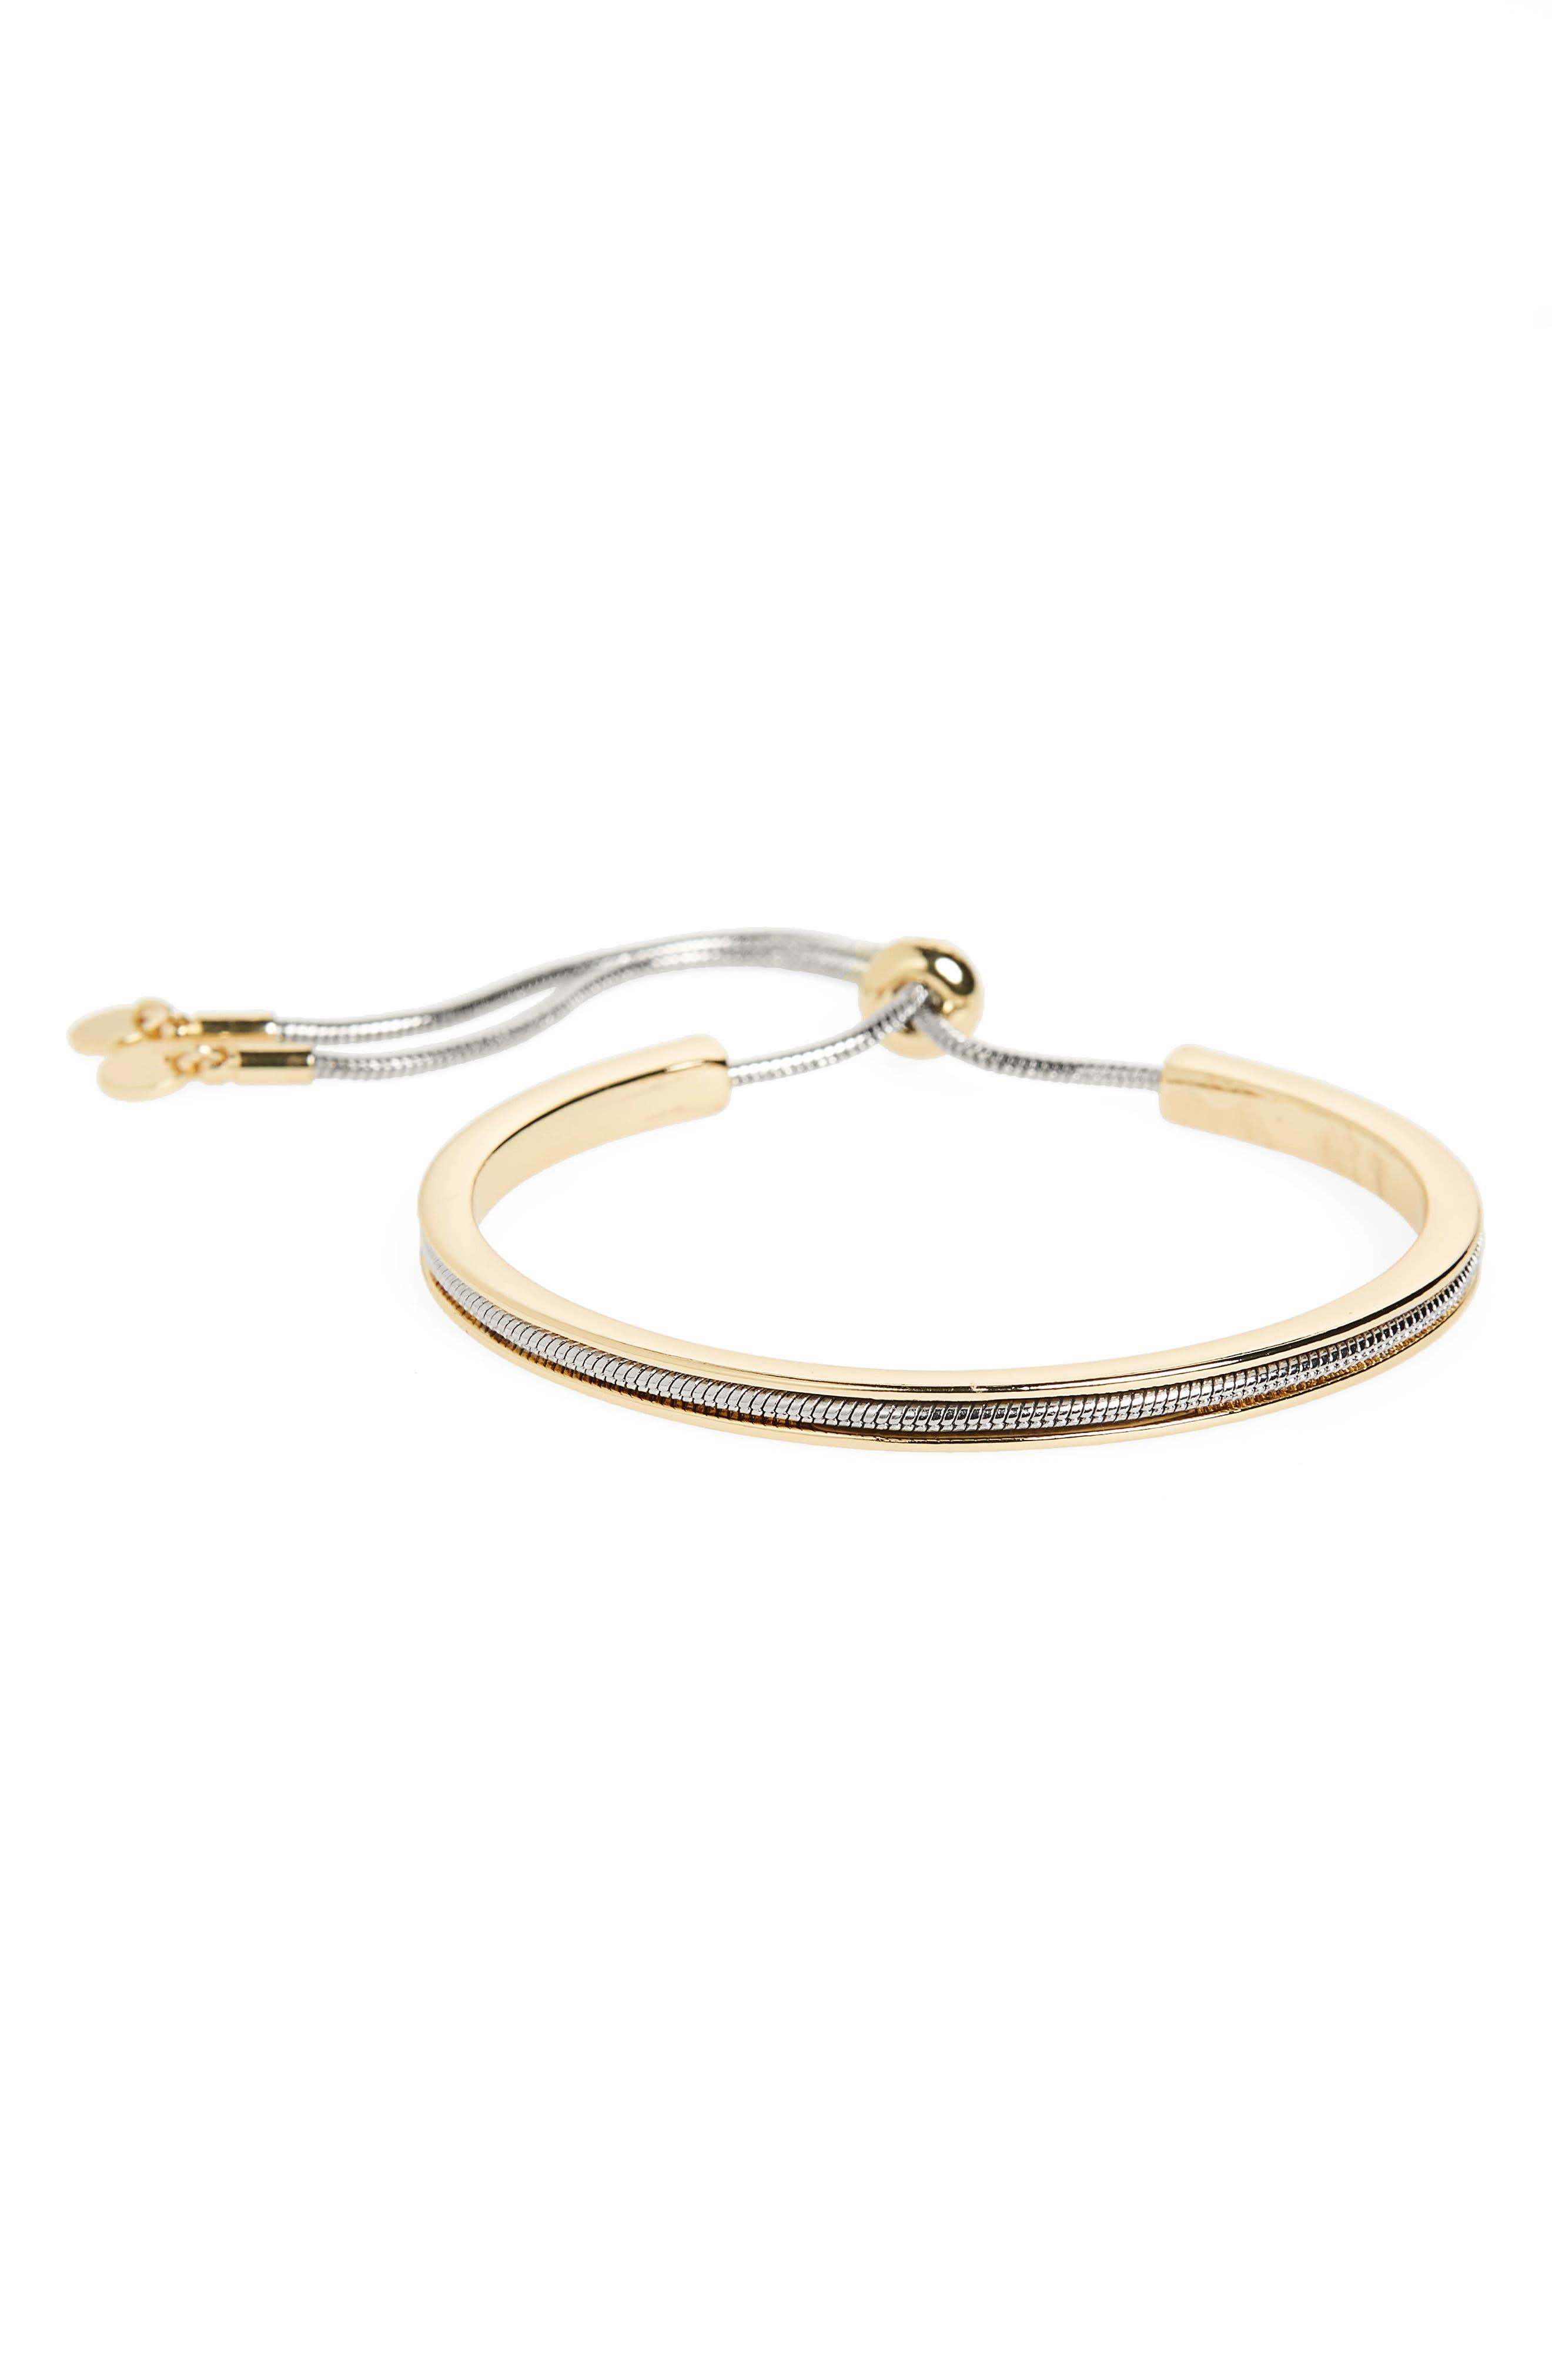 Chain & Metal Bar Bolo Bracelet,                             Main thumbnail 1, color,